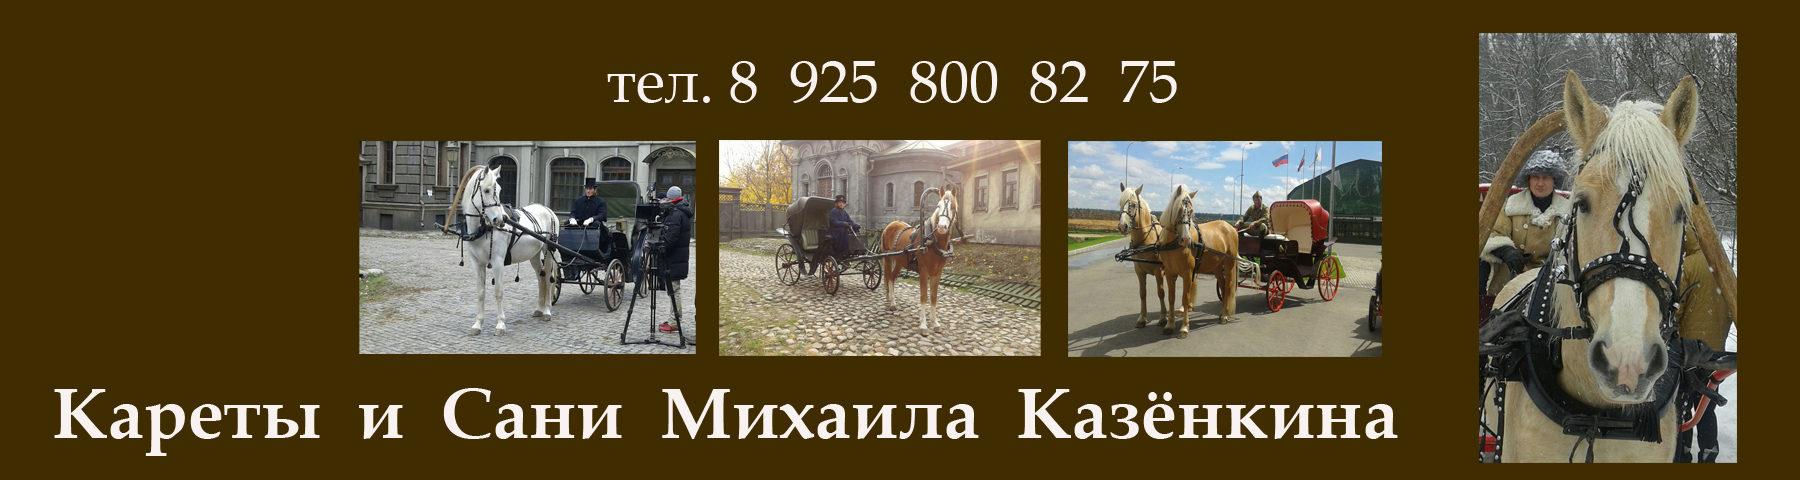 Кареты и сани М. Казенкина